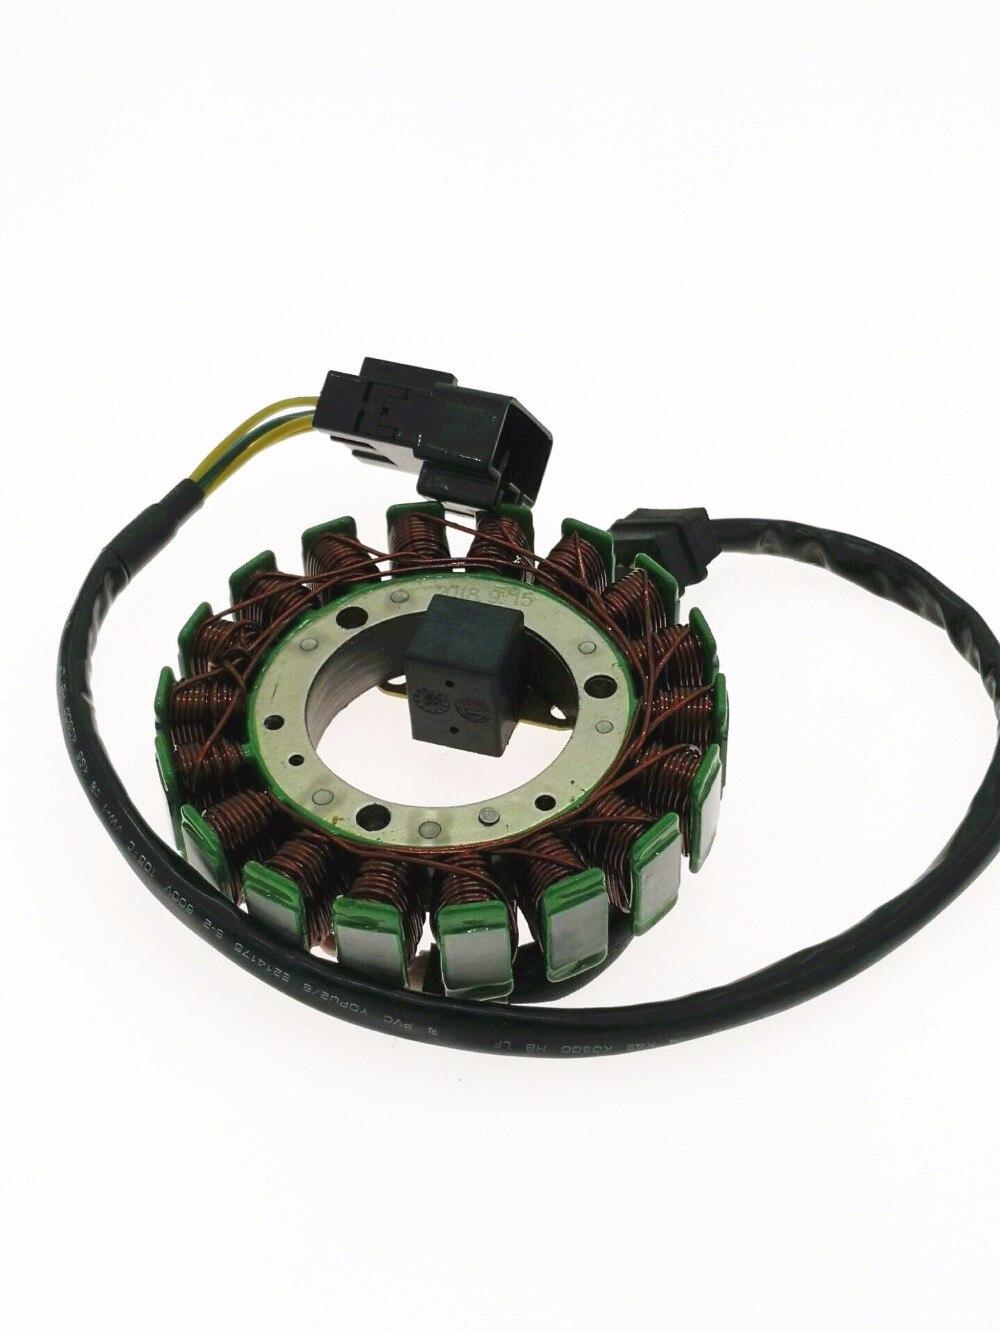 Magnetic motor stator/Magneto coil FOR CFMOTO CF500/CF600 X5 X6 Z6 part no   0180-032000 atv uv partst